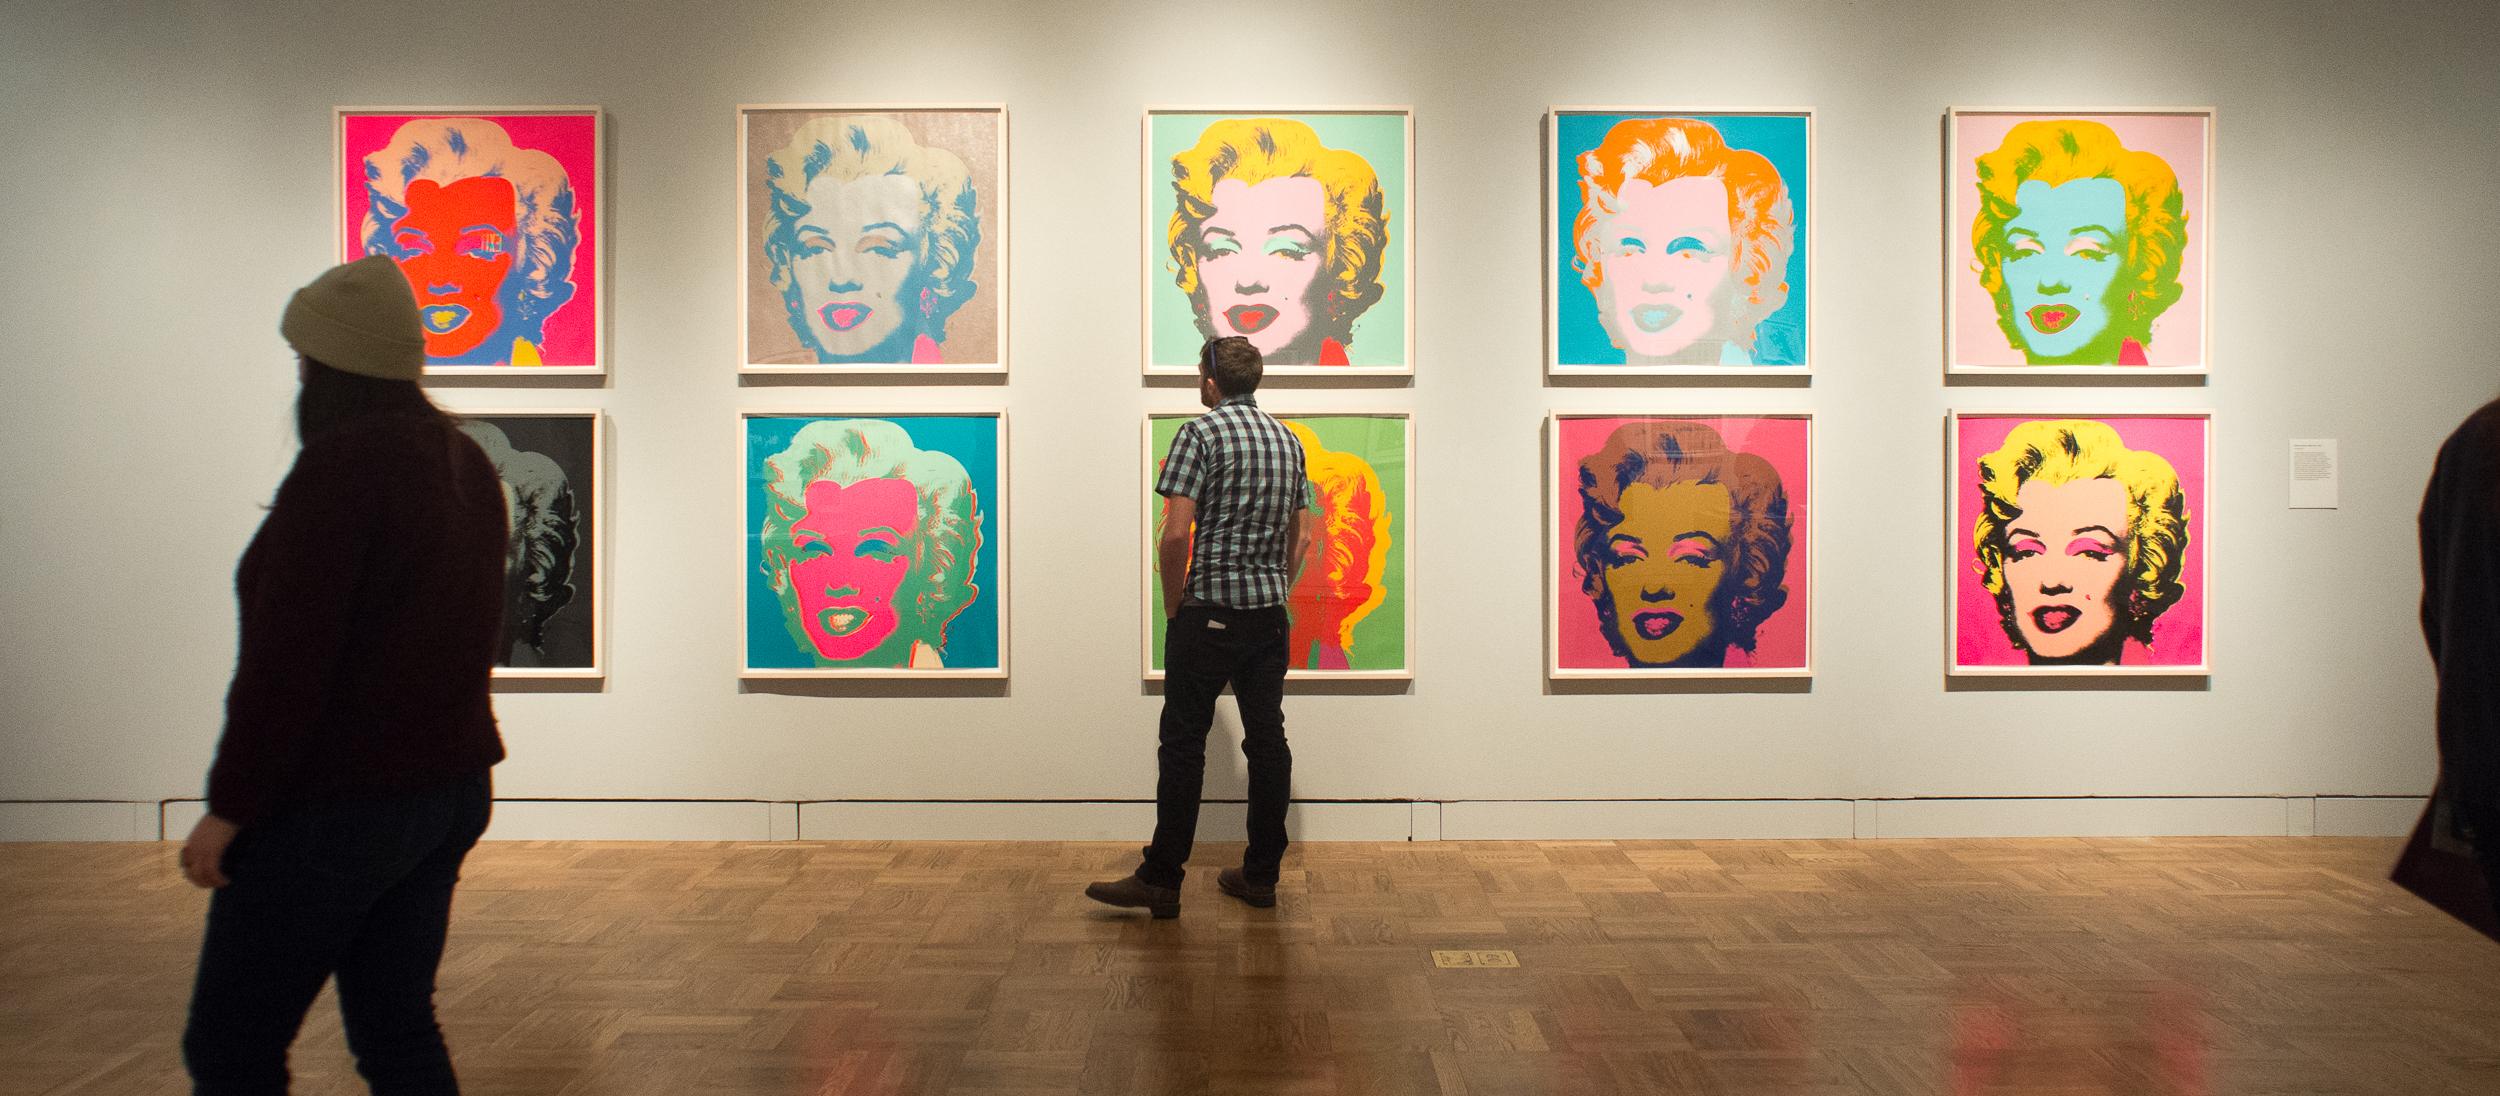 Warhol-Press-Review_2016-10-06-5292.jpg